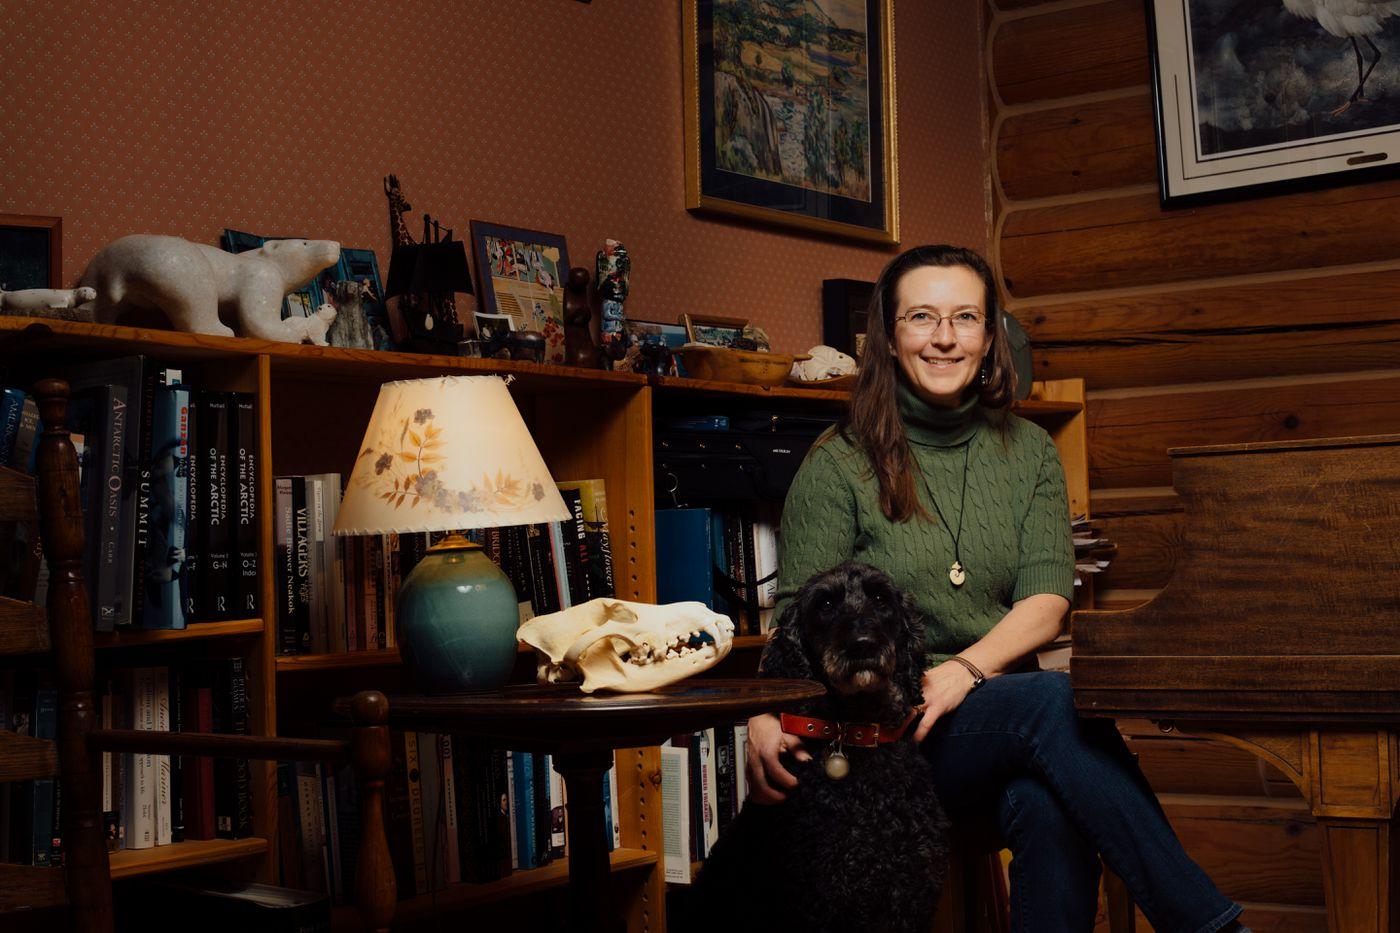 Kathy Burek sits for a portrait in her living room in Eagle River, Alaska. (Joshua Corbett)